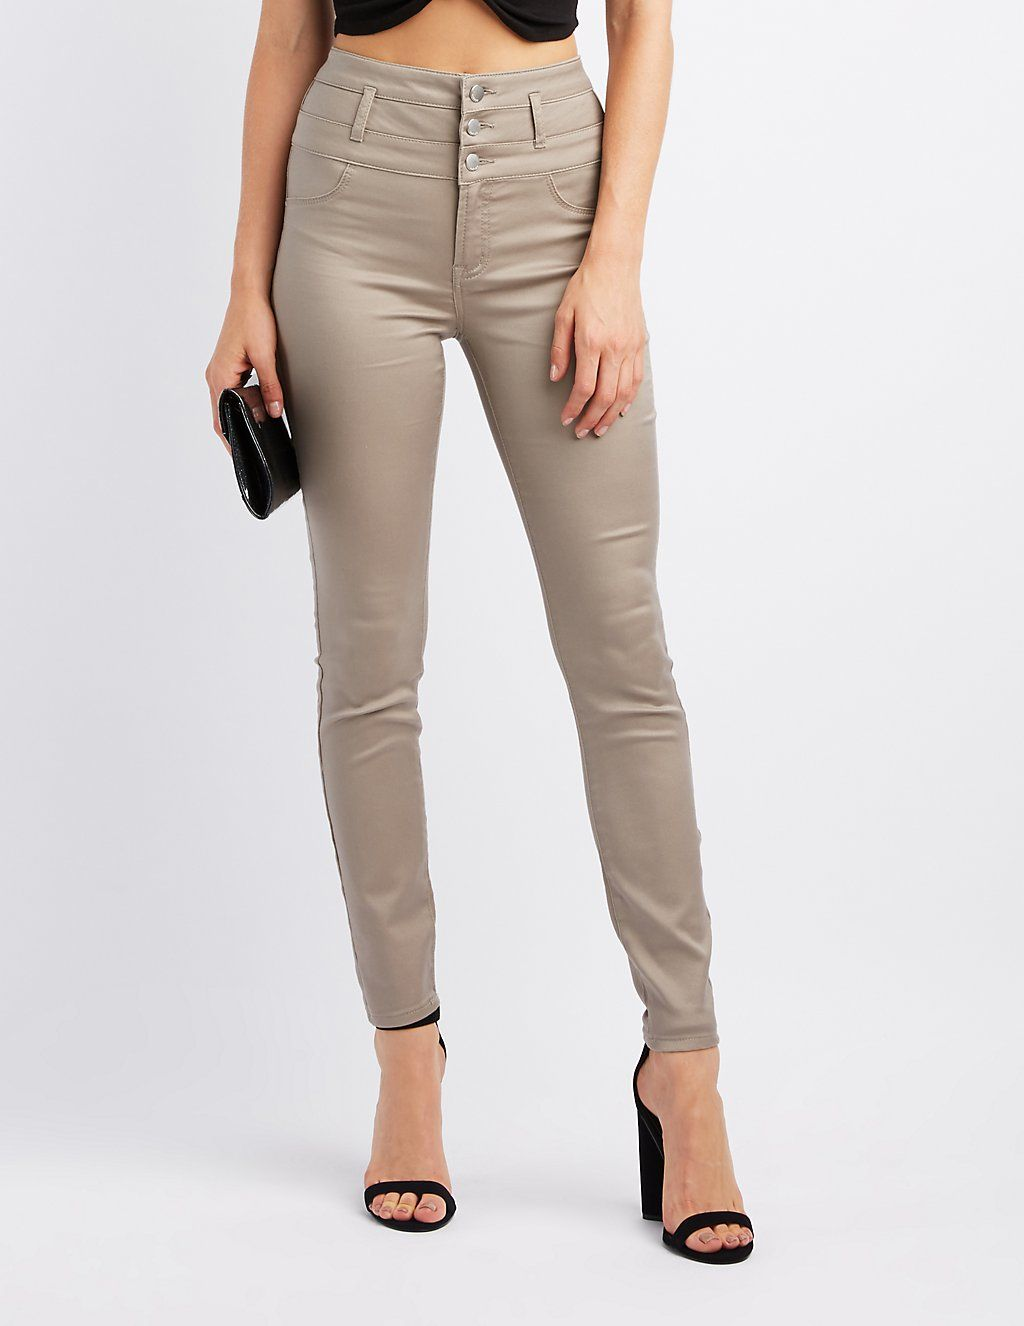 e79c1e9bd1 Refuge Hi-Waist Skinny Jeans   Charlotte Russe   Bottoms   Skinny ...